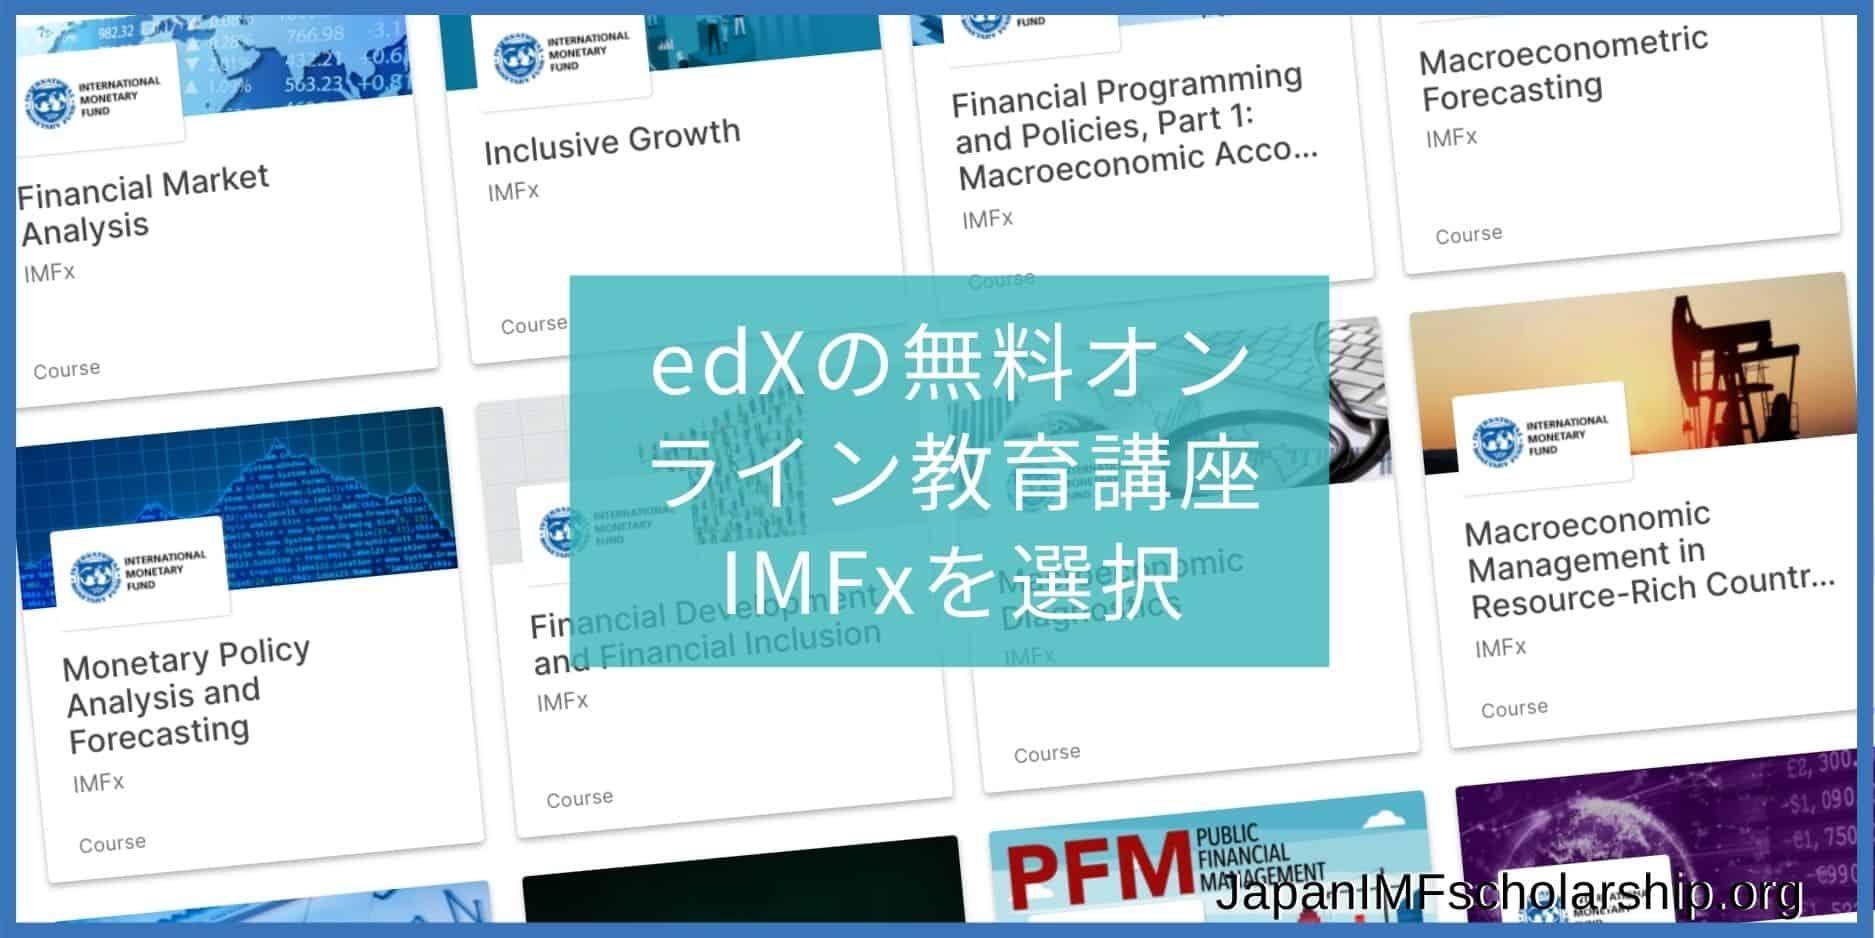 jisp edx imfx free online economics and finance courses